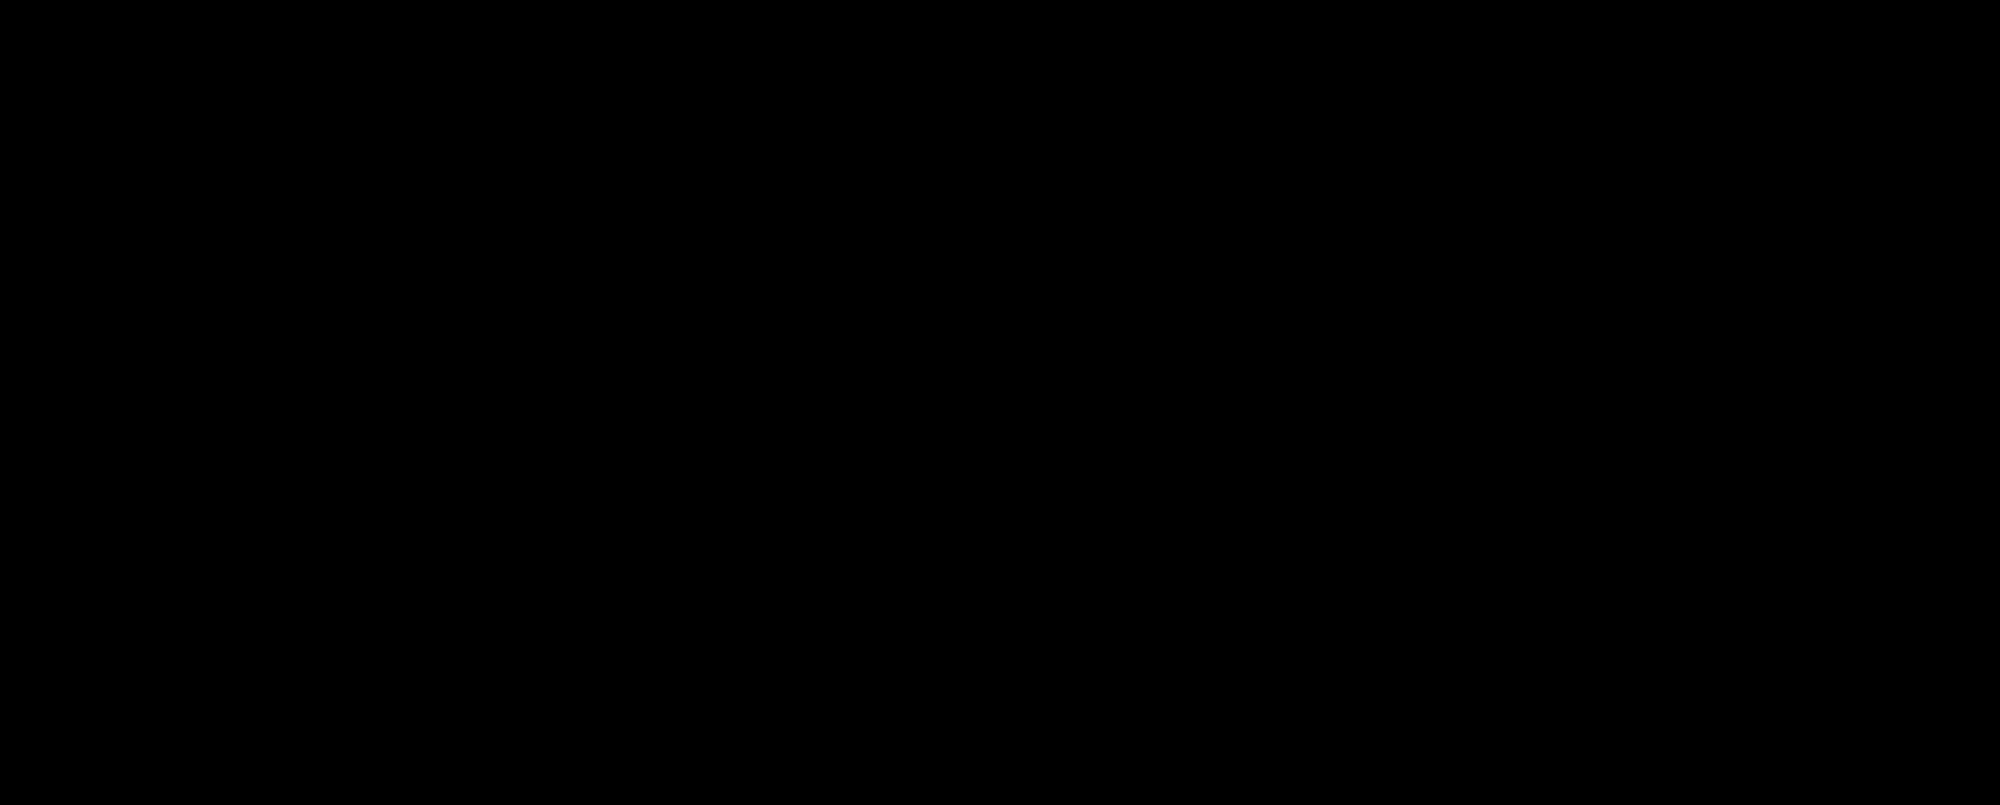 spsa-bg-black